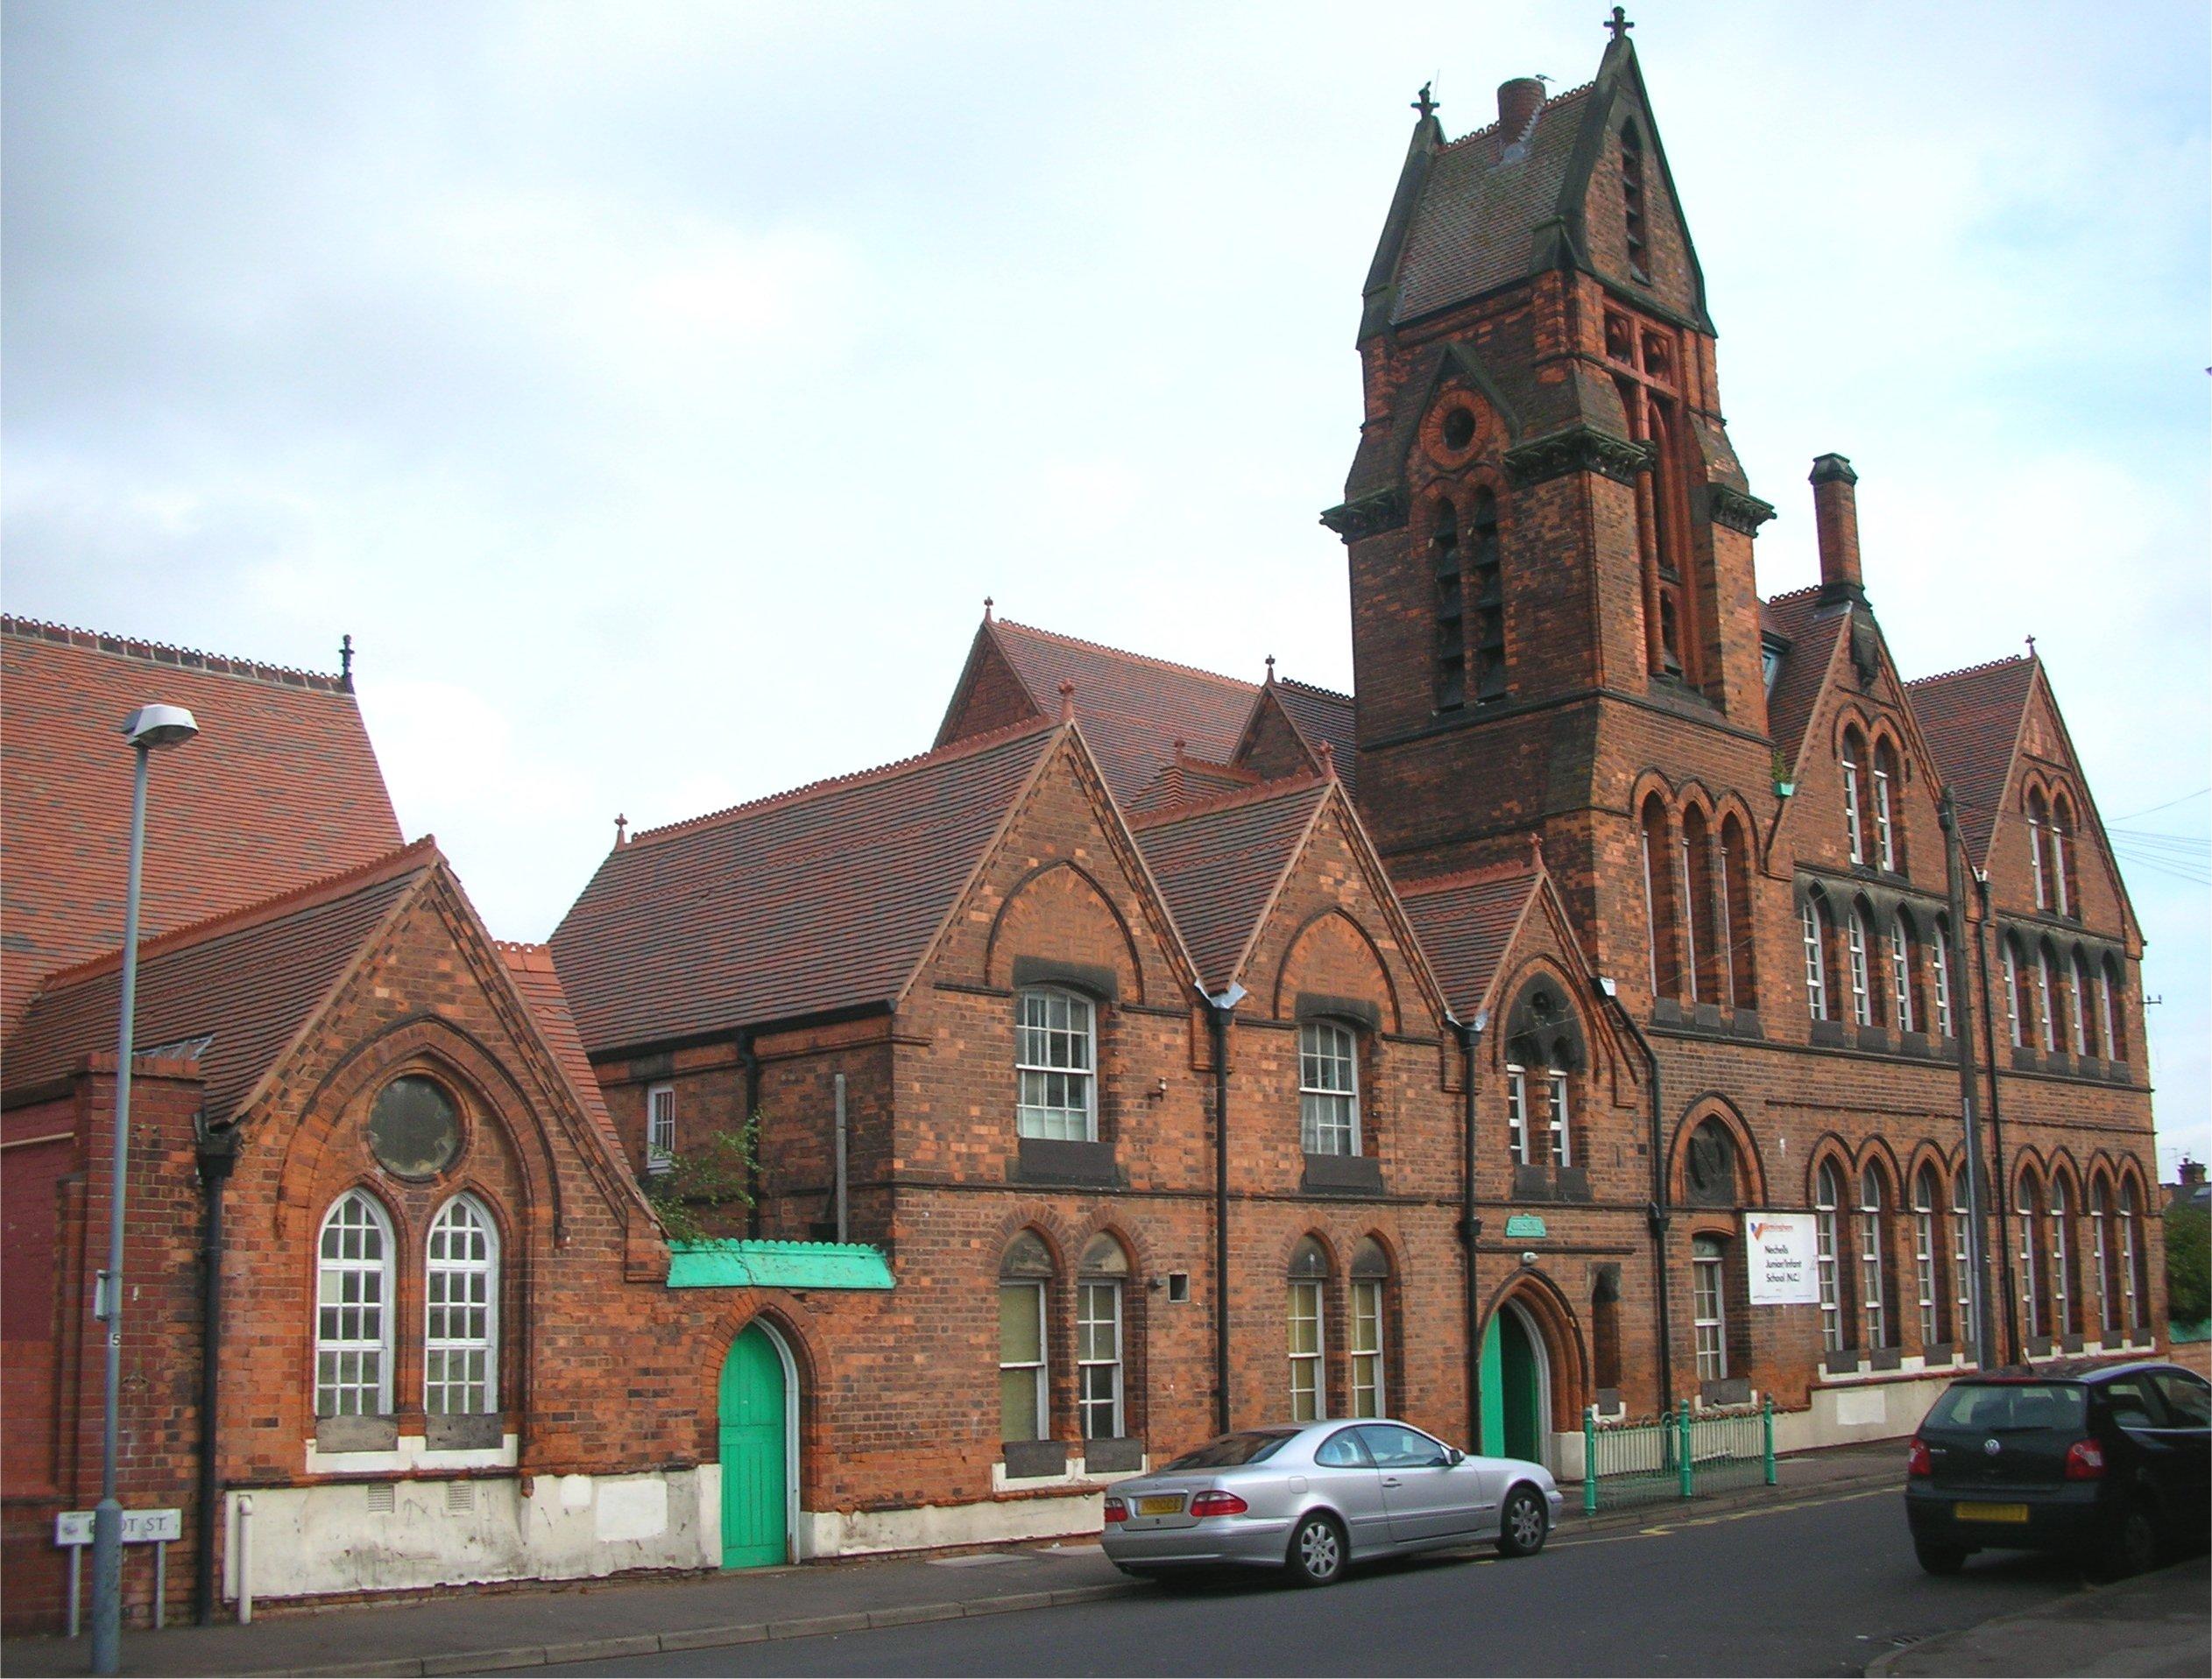 Yardley Borough Building Permits